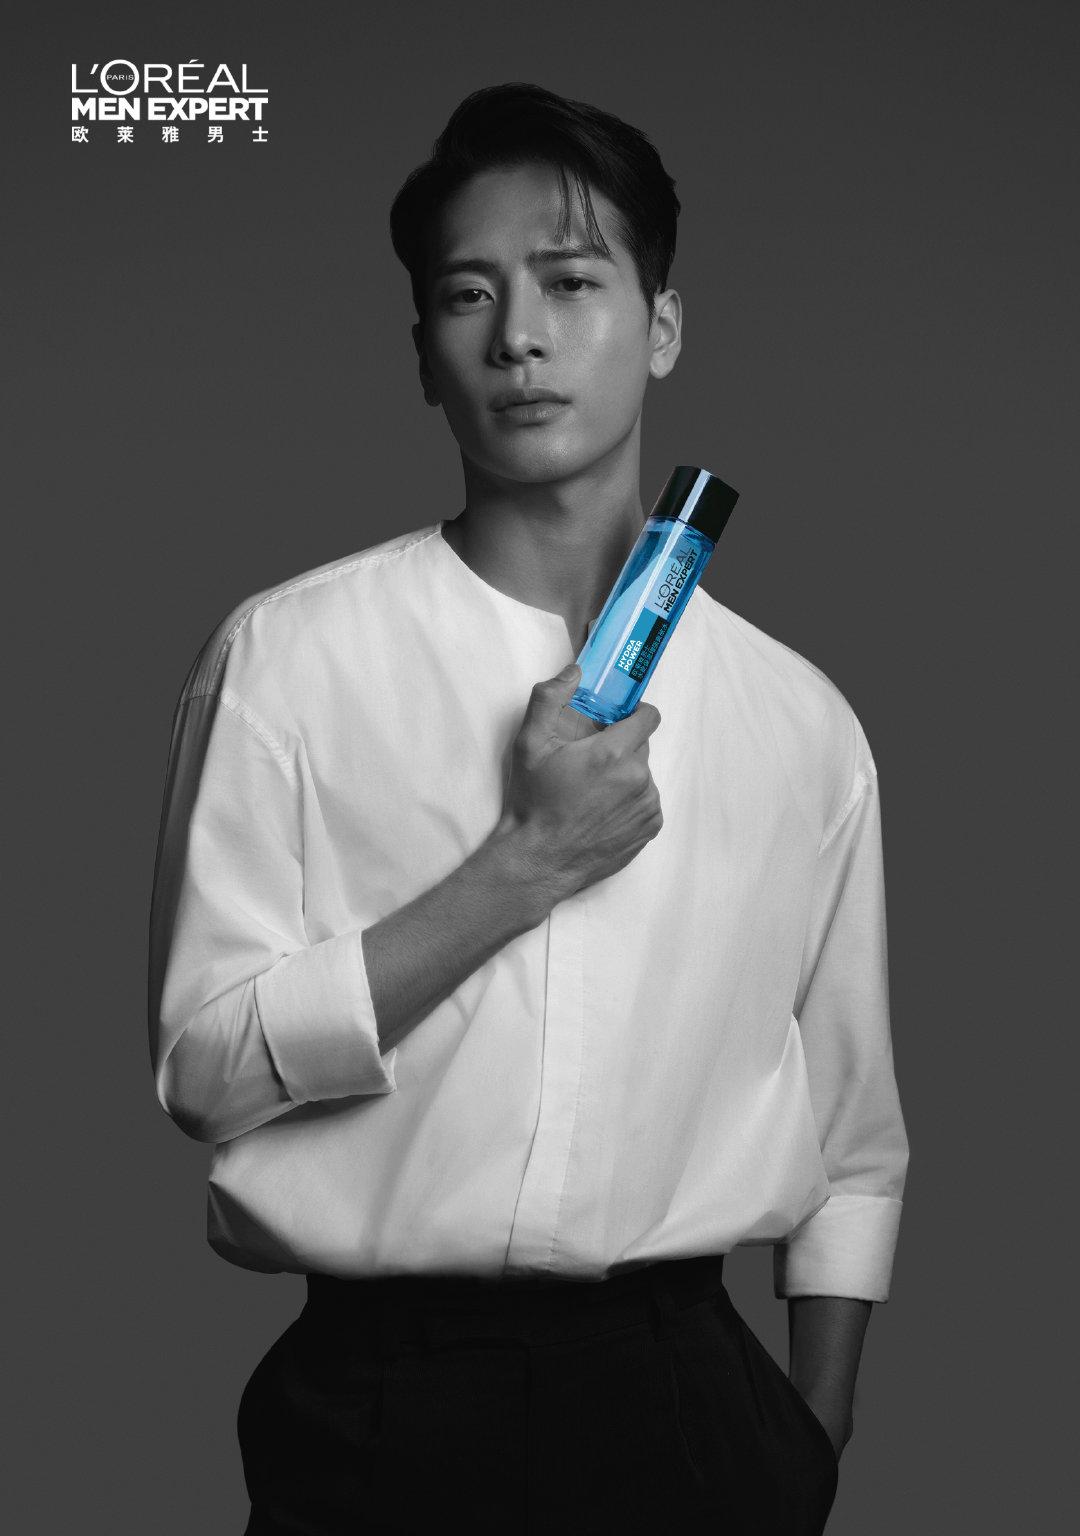 Jackson din GOT7 devine ambasador global pentru firma L'Oréal!   K ...